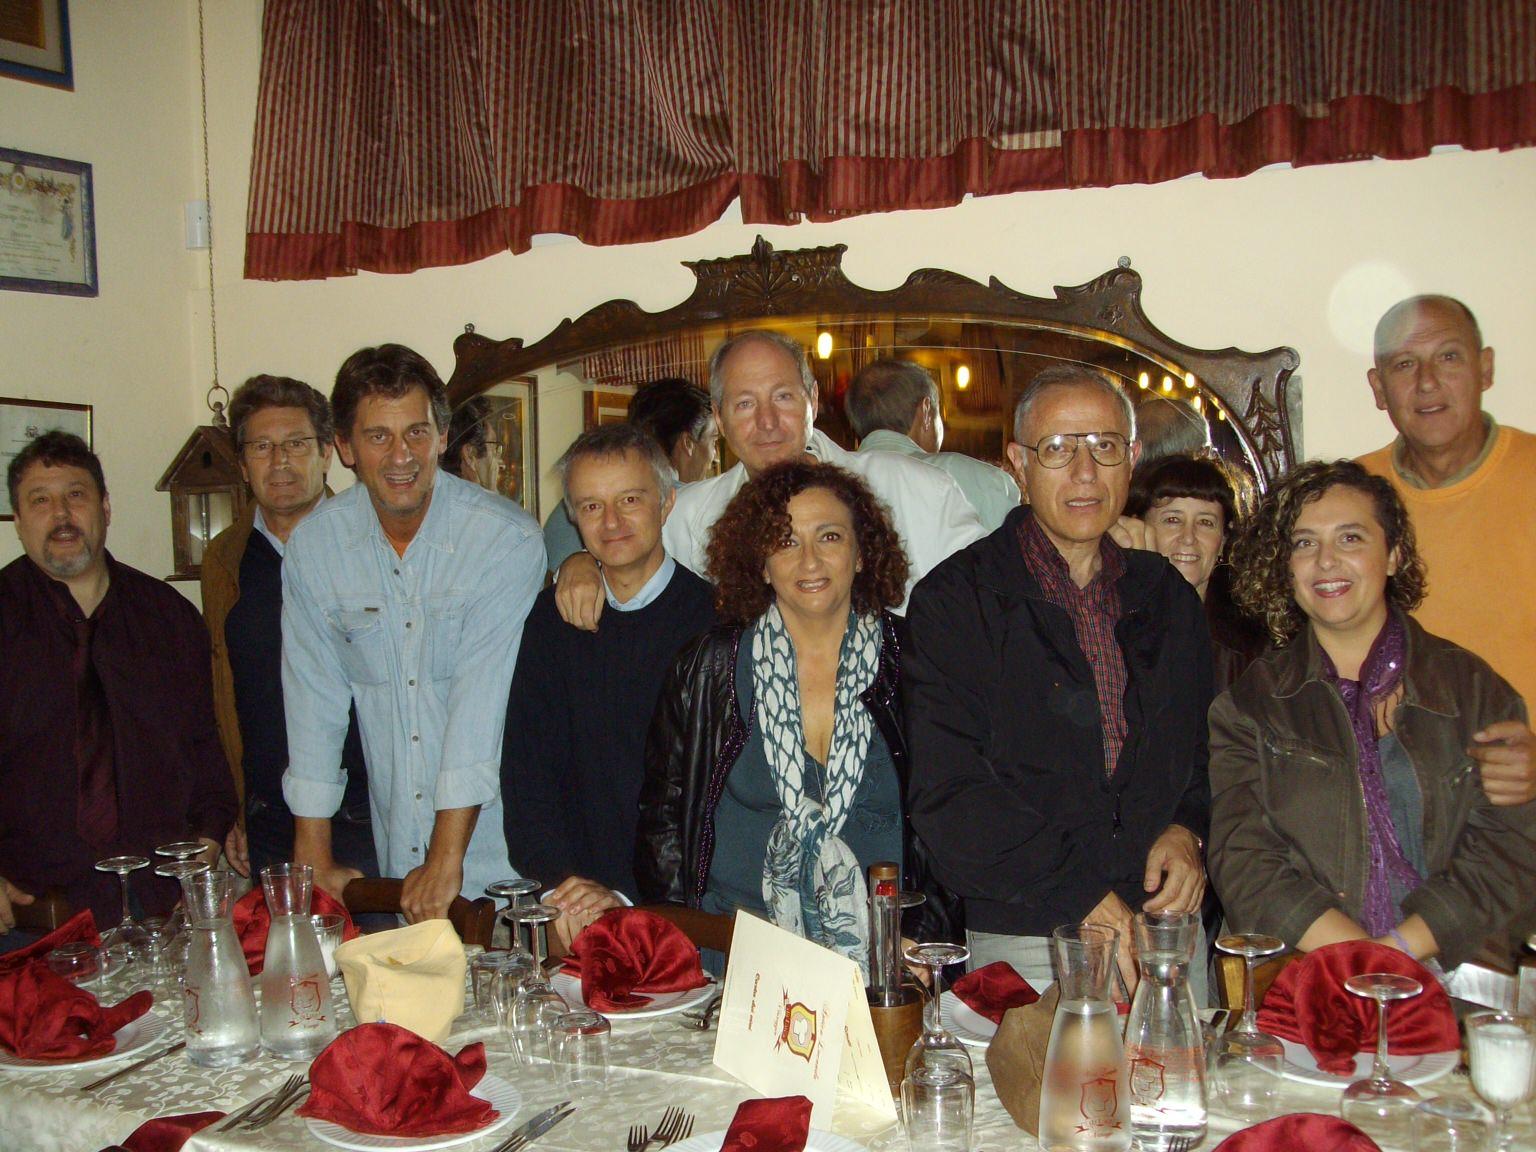 Radio Babilonia Reunion alla Notte Bianca